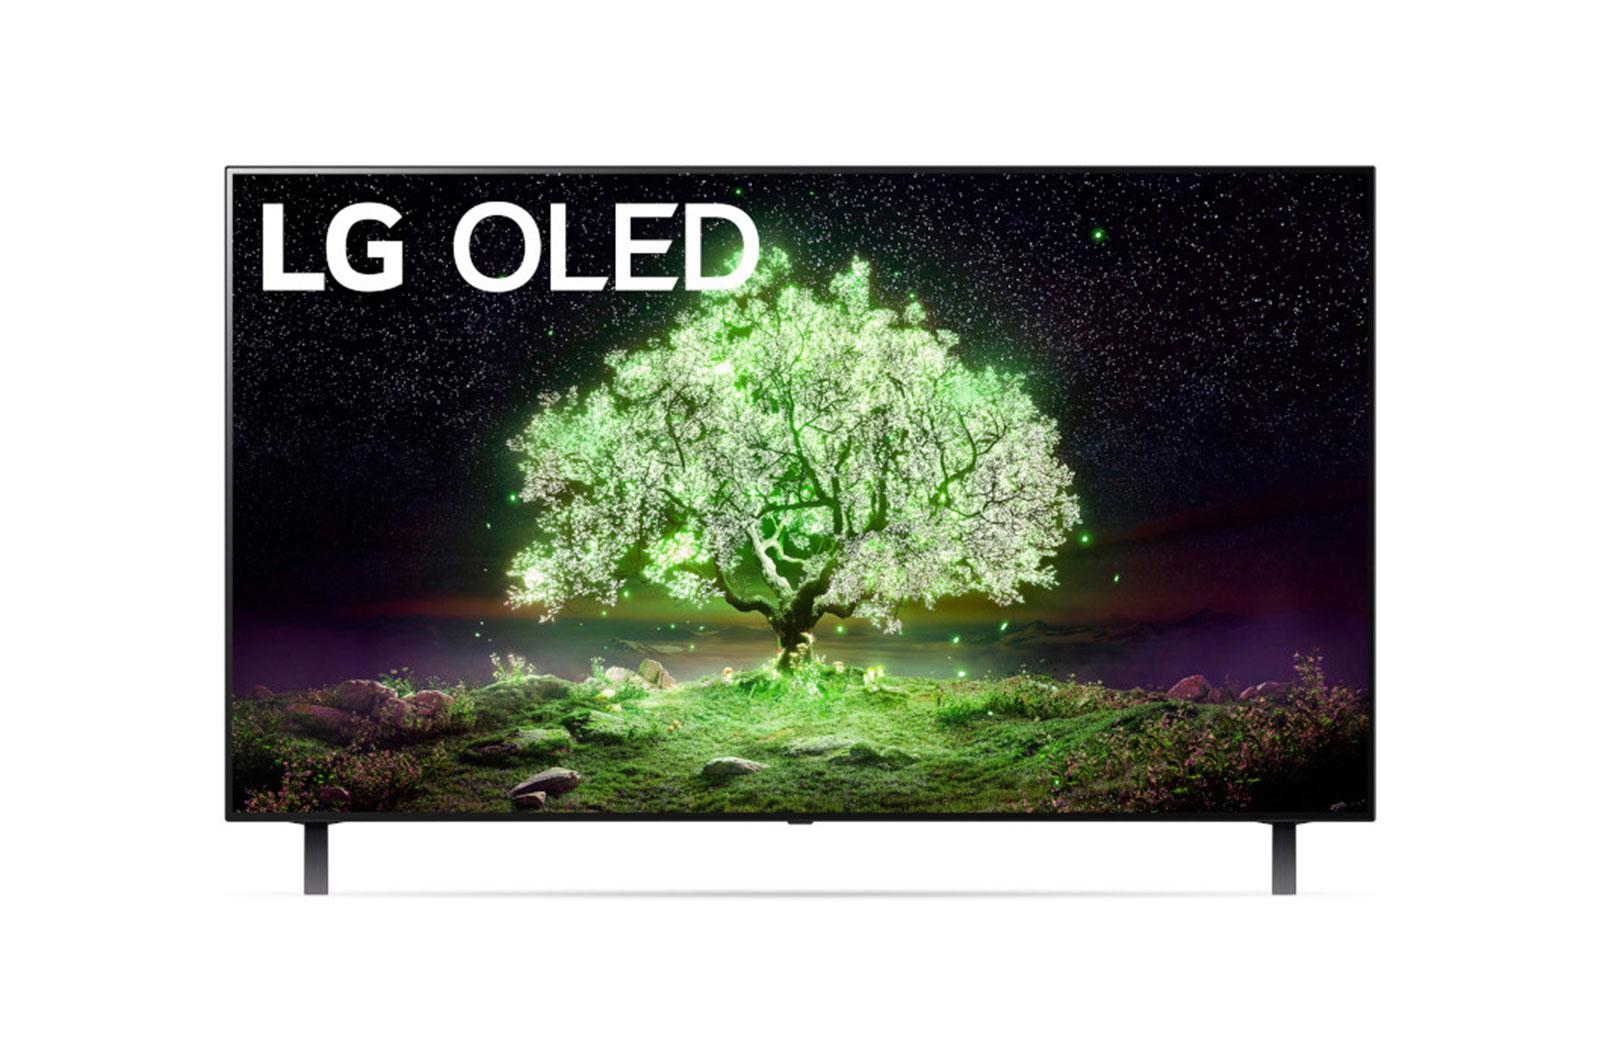 LG A1 48 inch Class 4K Smart OLED TV w/ ThinQ AI® (48.2'' Diag)